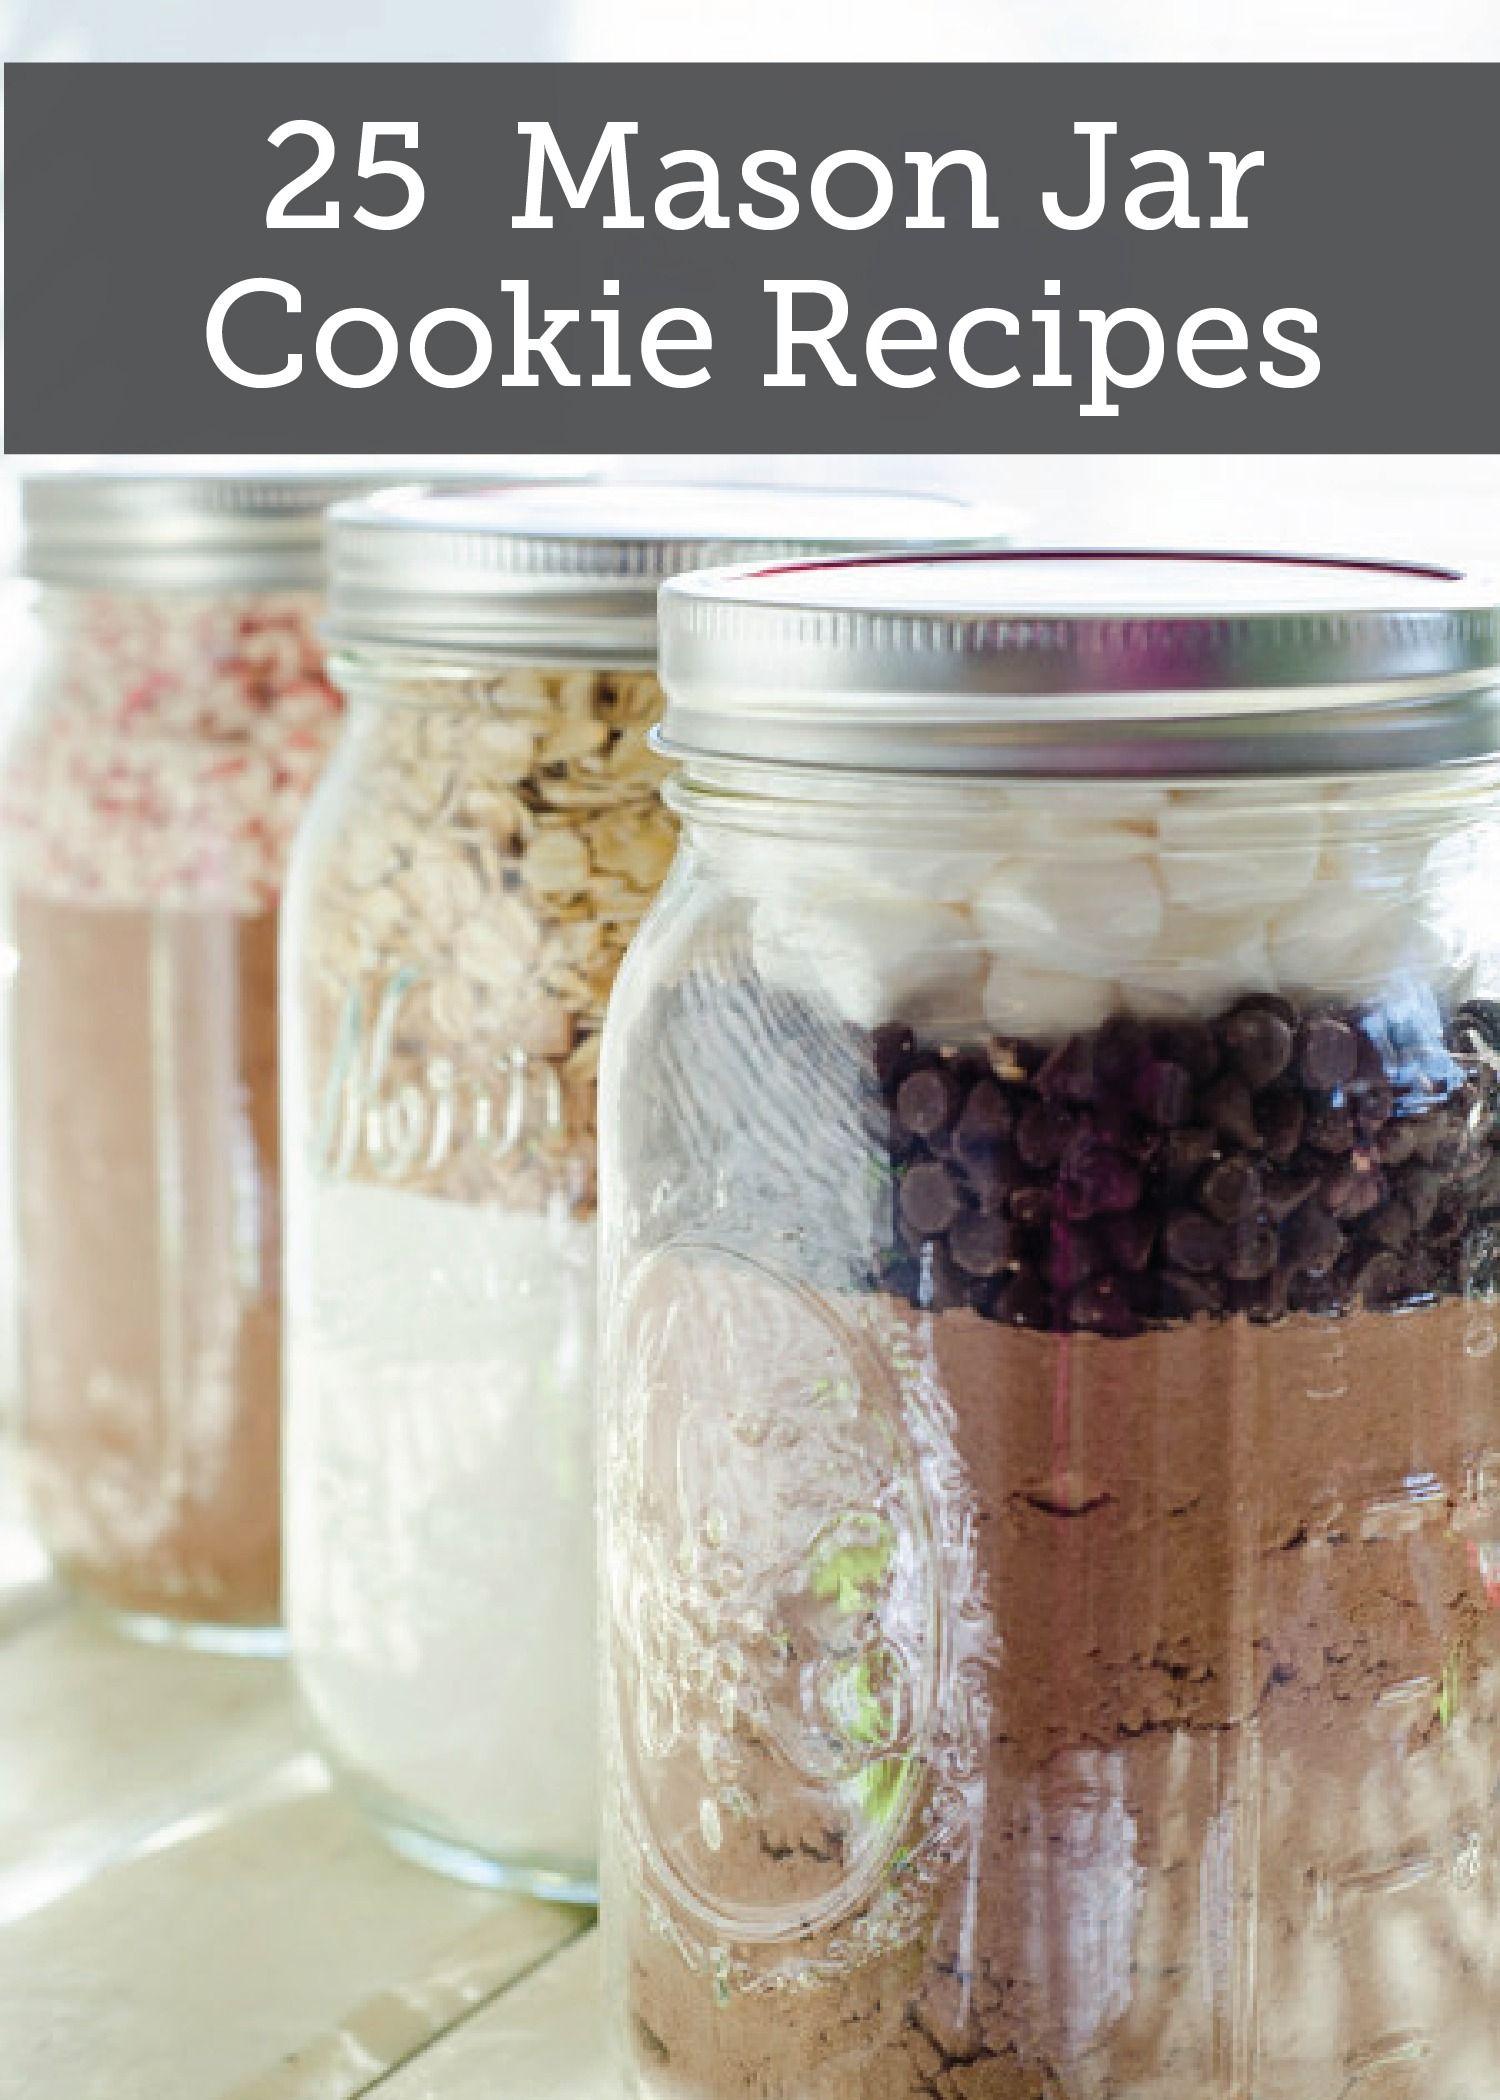 25 Easy Mason Jar Cookie Recipes Freebie Finding Mom Mason Jar Cookies Mason Jar Meals Mason Jar Cookie Recipes